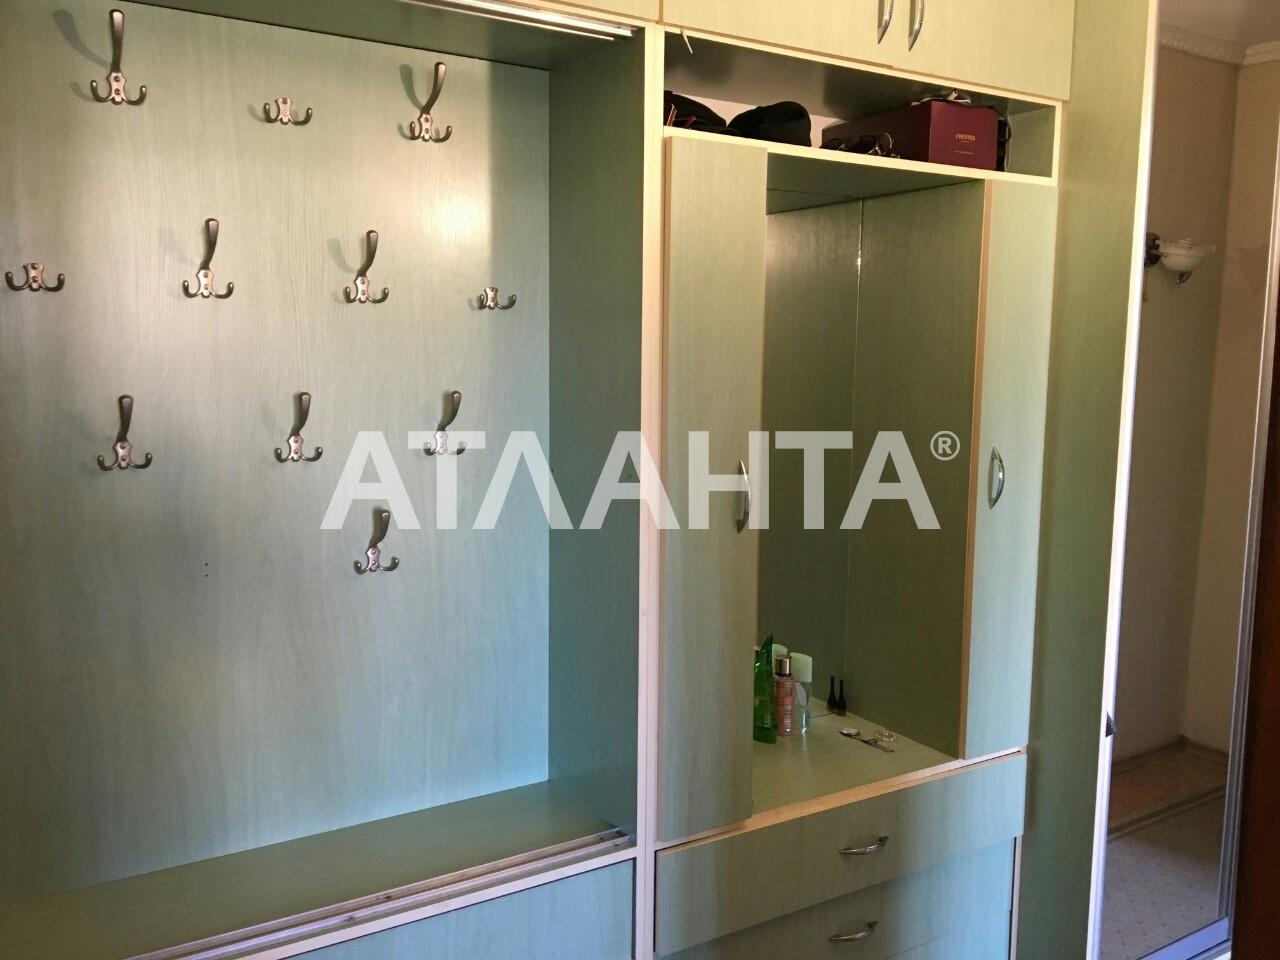 Продается 3-комнатная Квартира на ул. Архитекторская — 49 000 у.е. (фото №11)